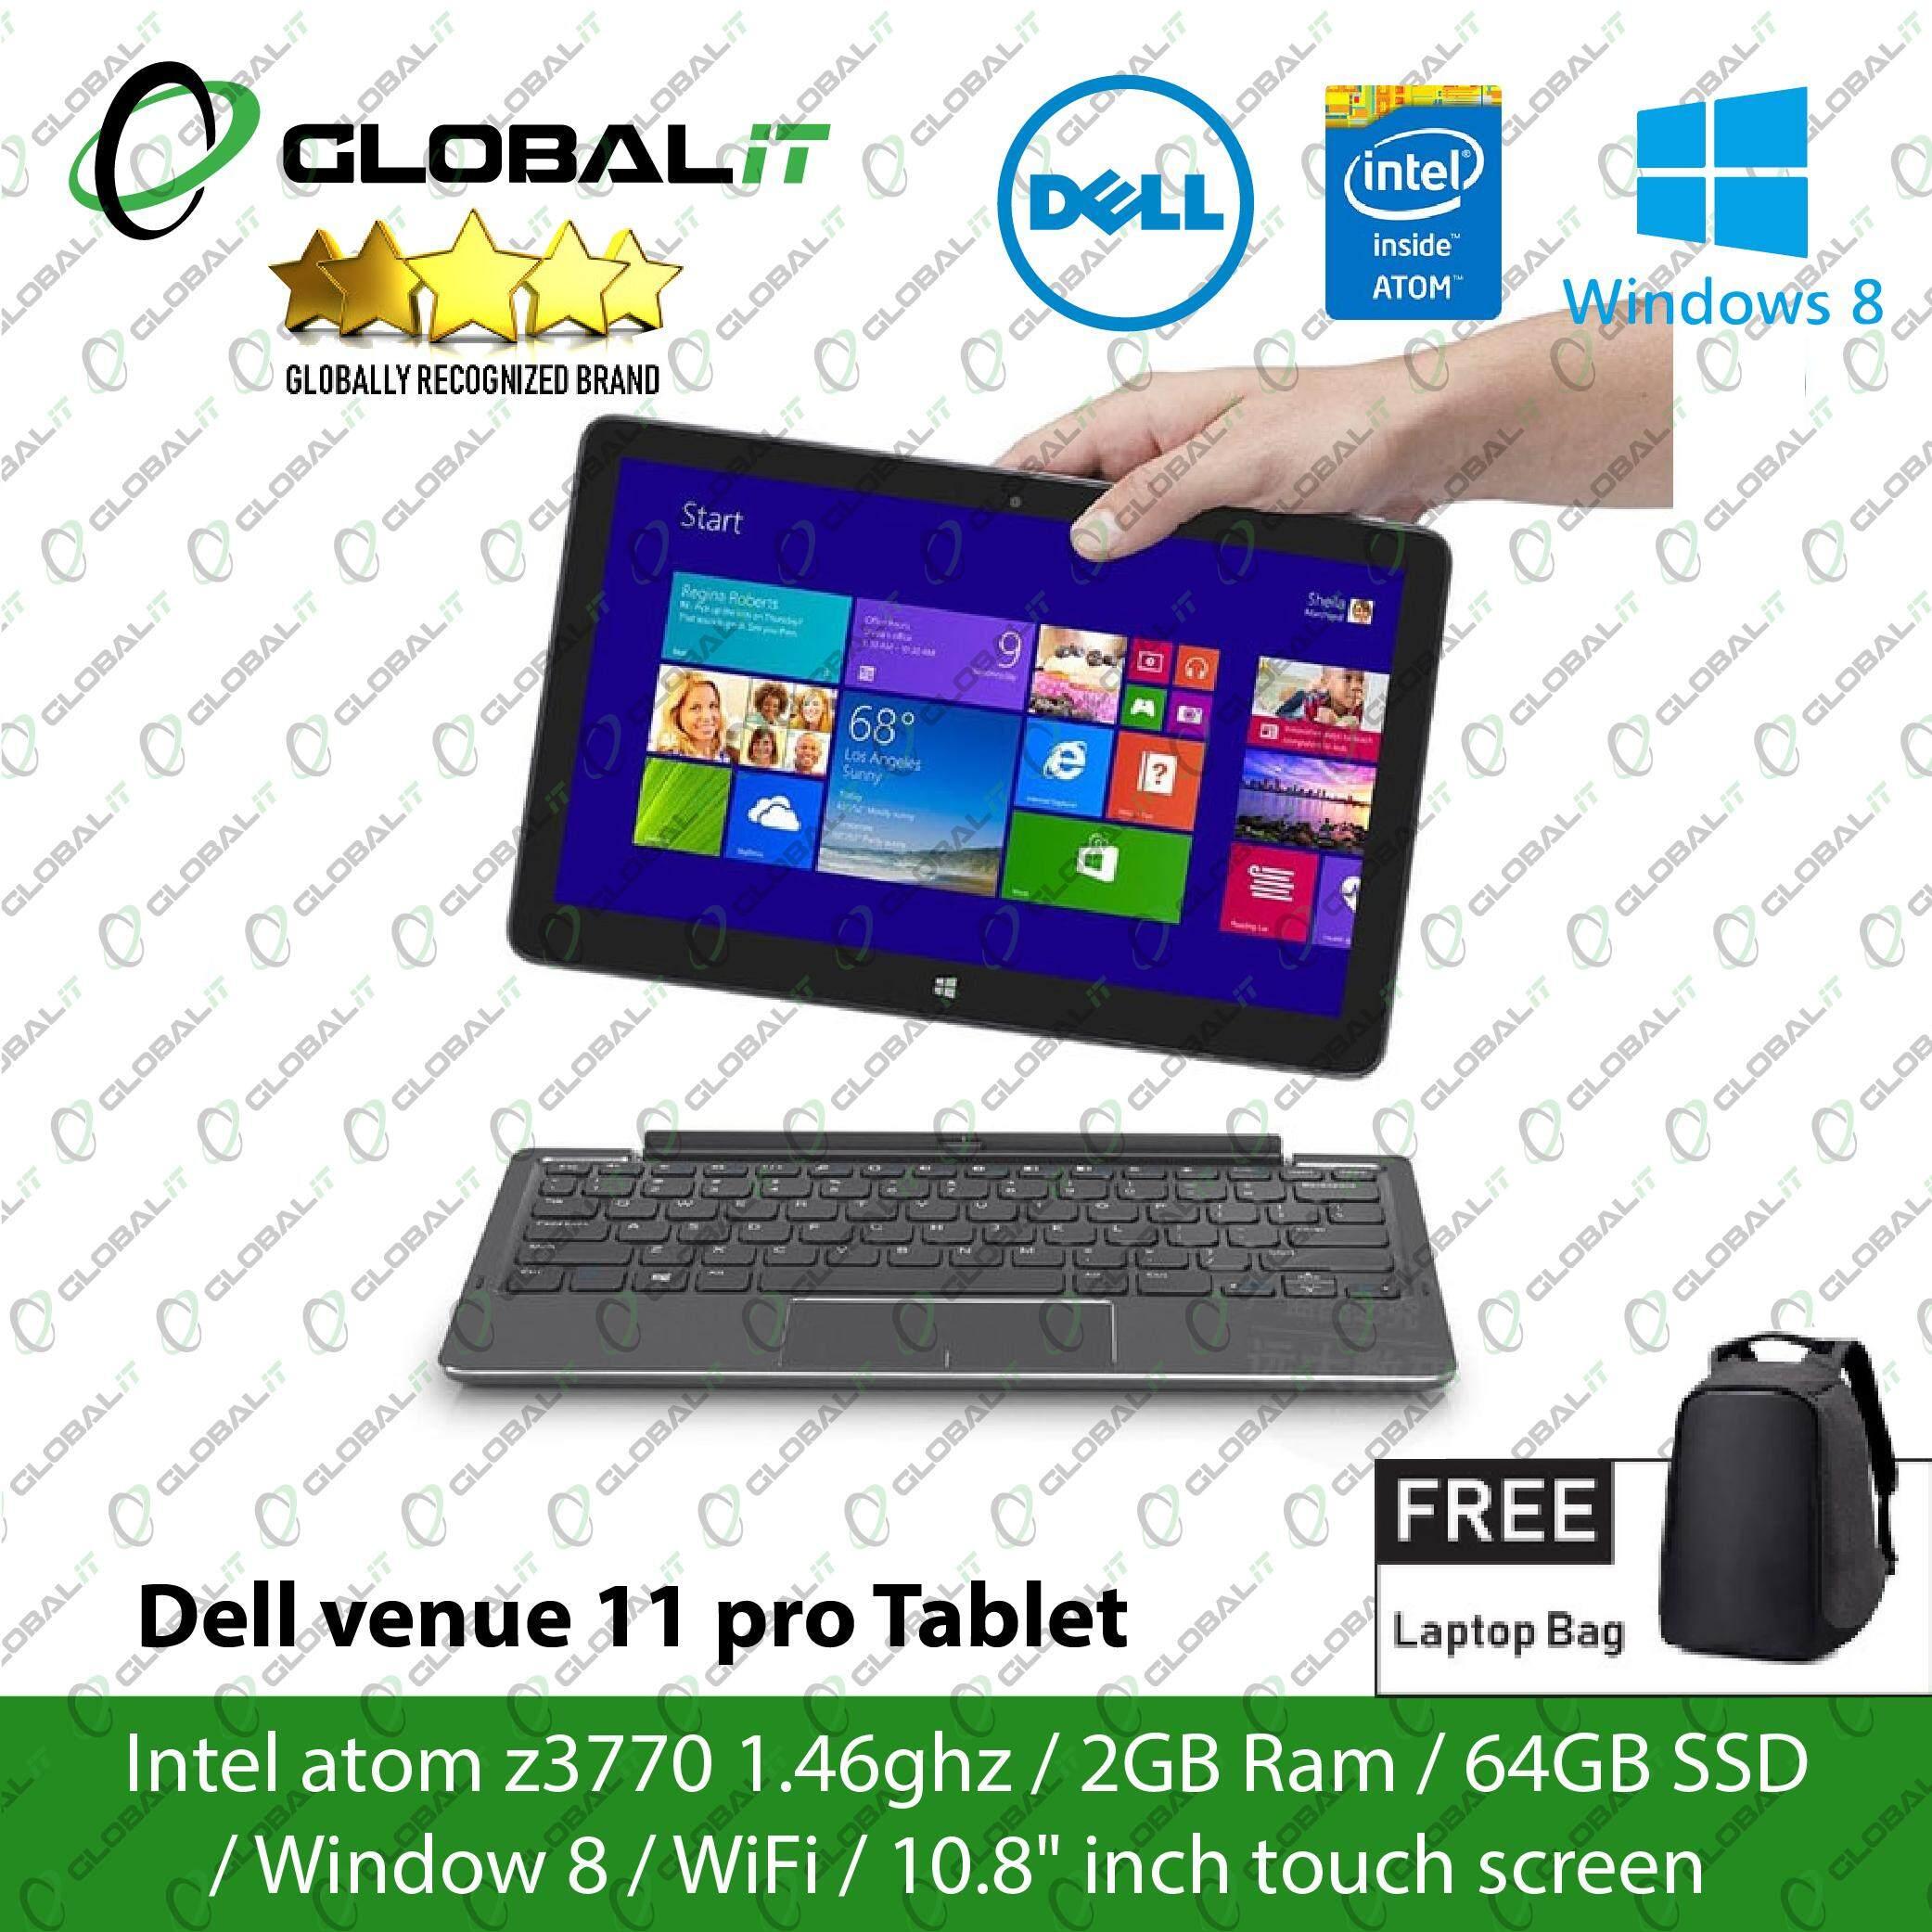 (Refurbished Tablet) Dell Venue 11 Pro Tablet / 10.8 inch LCD Touch Screen / Intel Atom Z3770 / 2GB DDR3 Ram / 64GB SSD / WiFi / Windows 8 Pro Malaysia